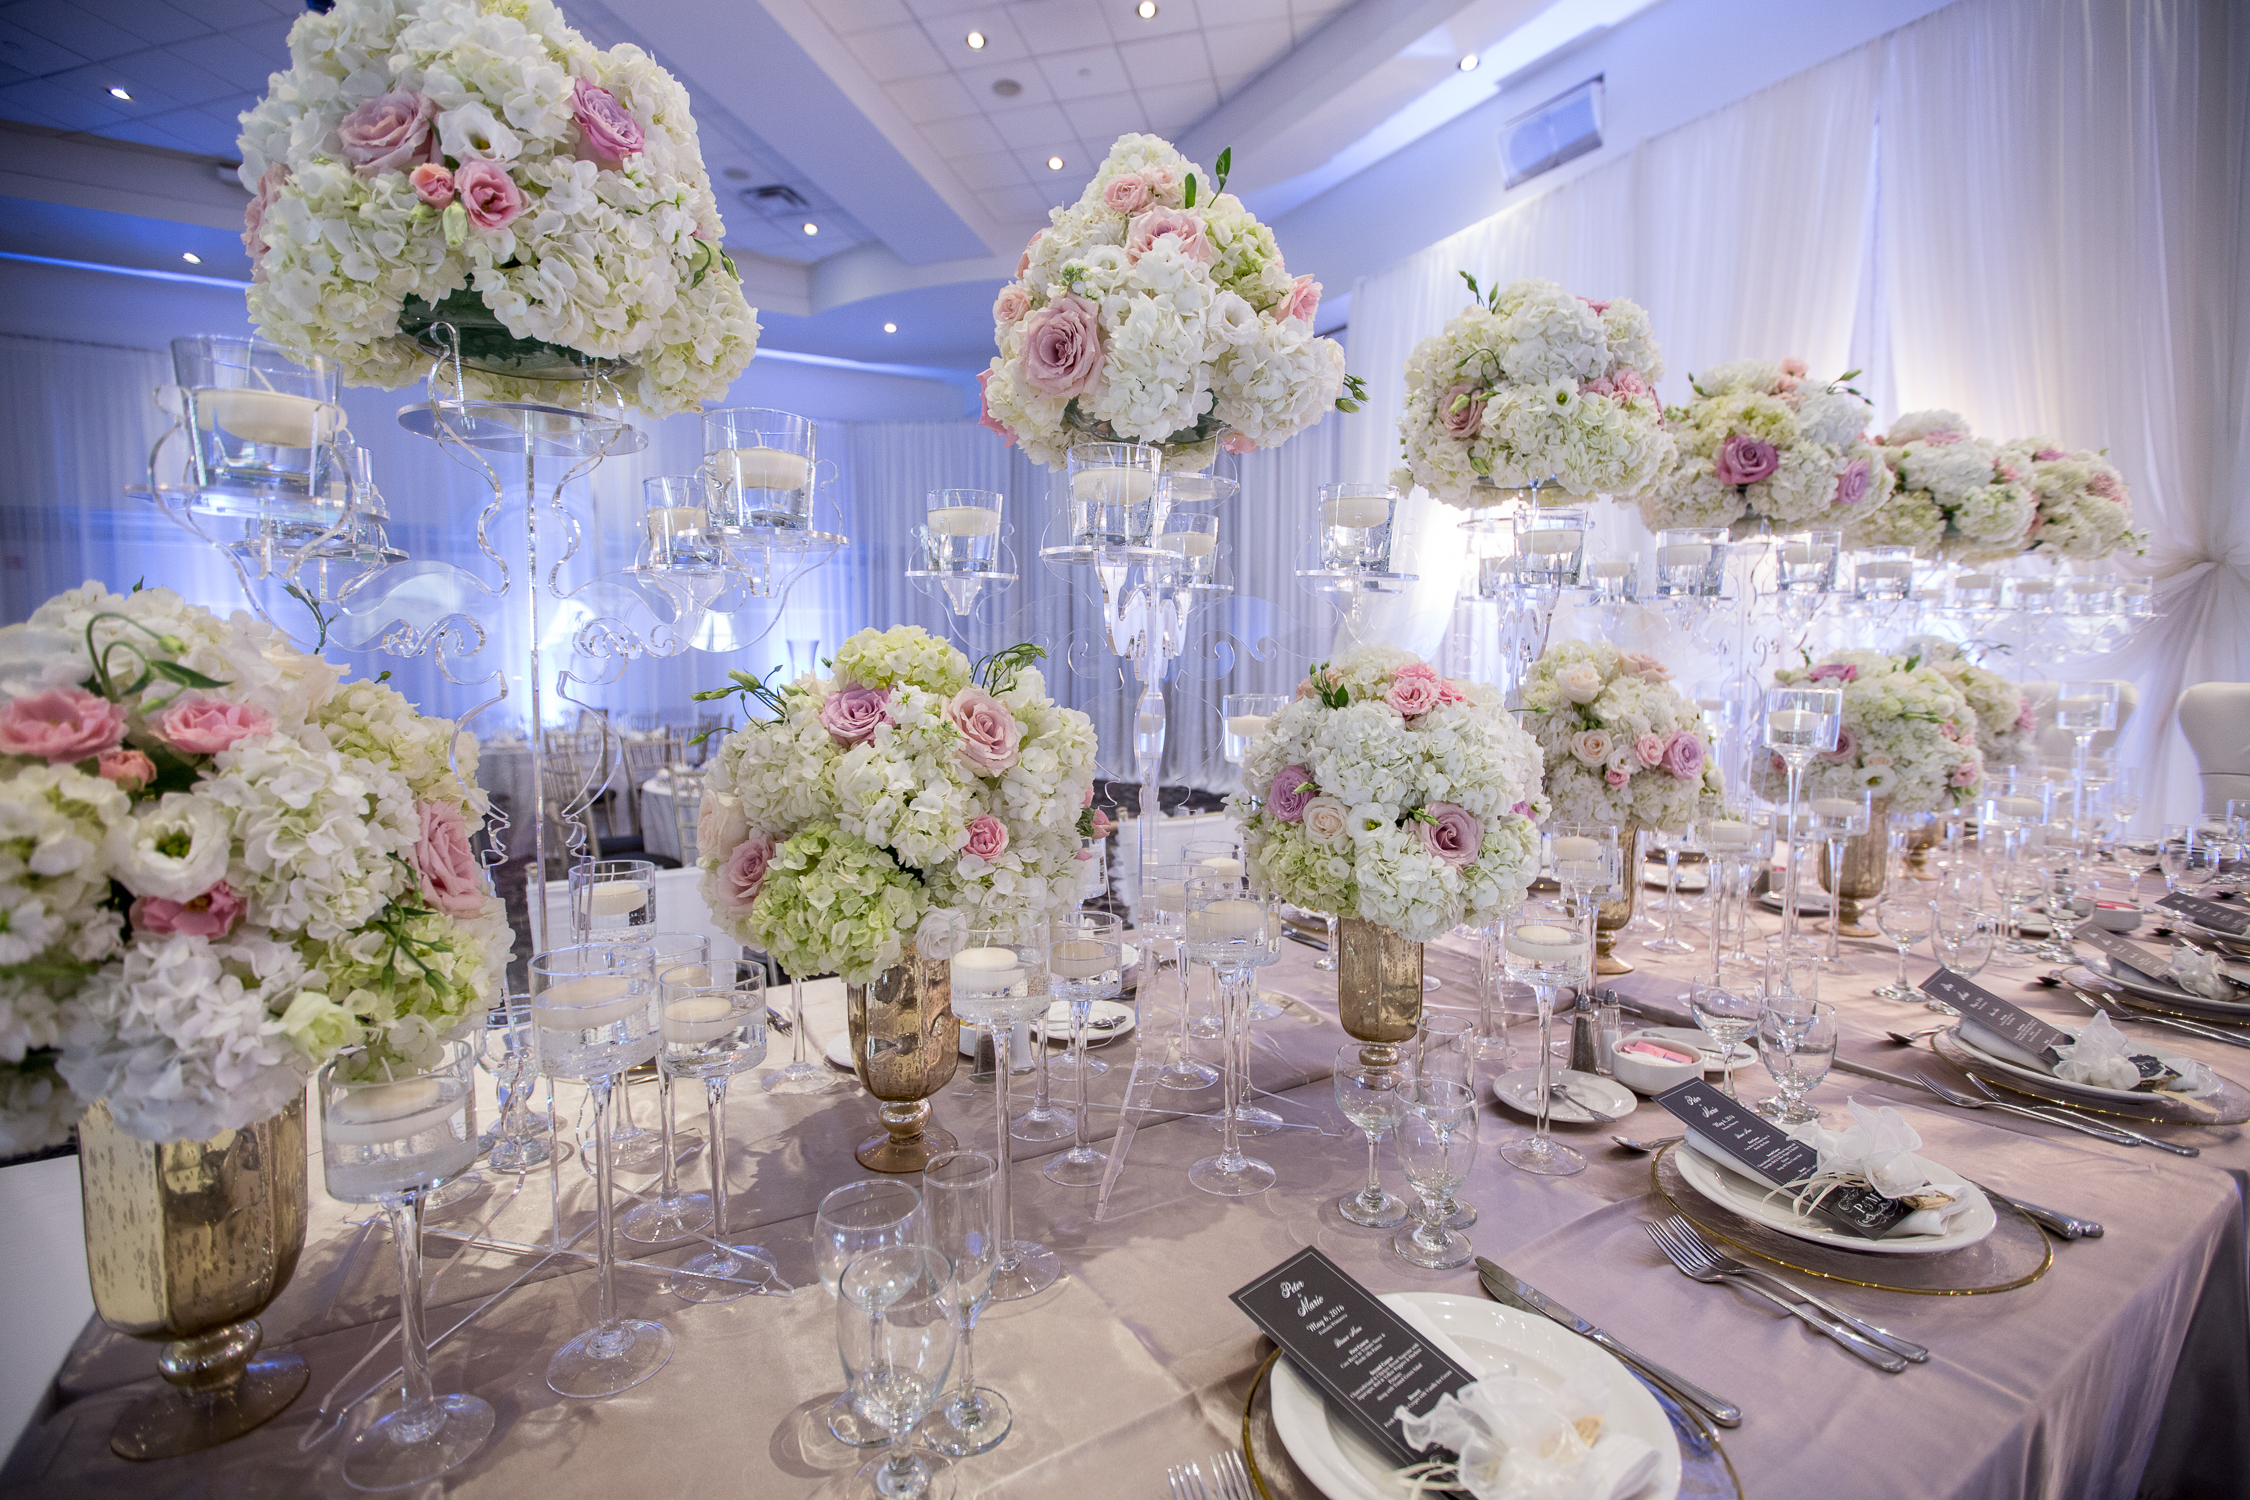 Peter-and-Marie-Wedding-Fontana-Primavera-Graydon-Hall-Manor-Toronto-Ontario-Canada-0029.jpg